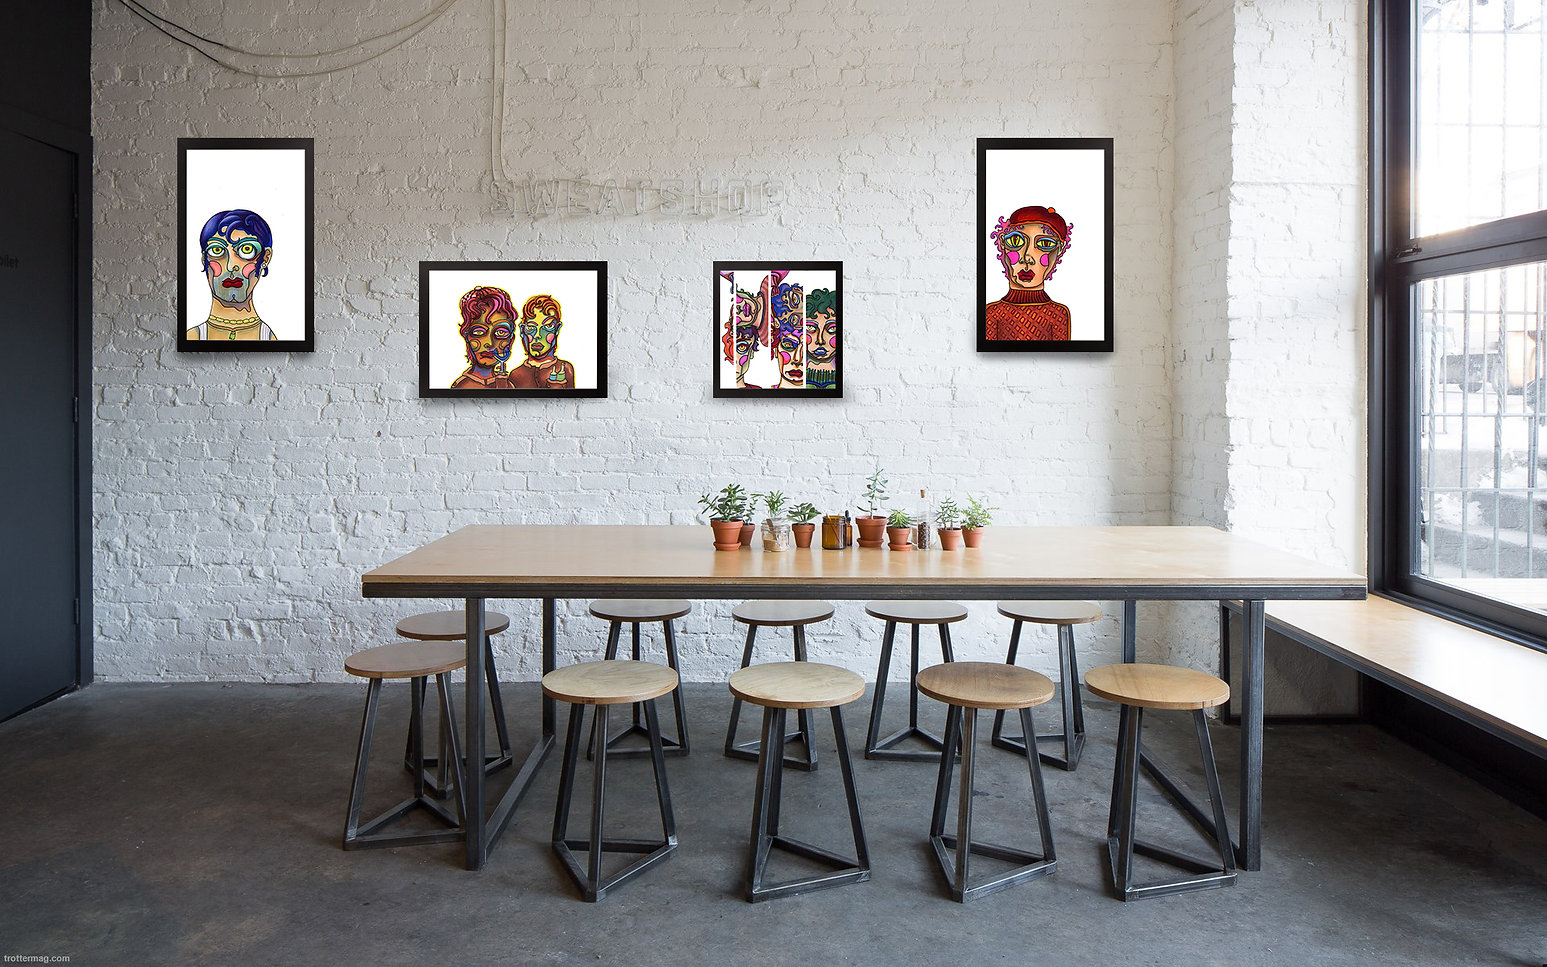 cofee shop art